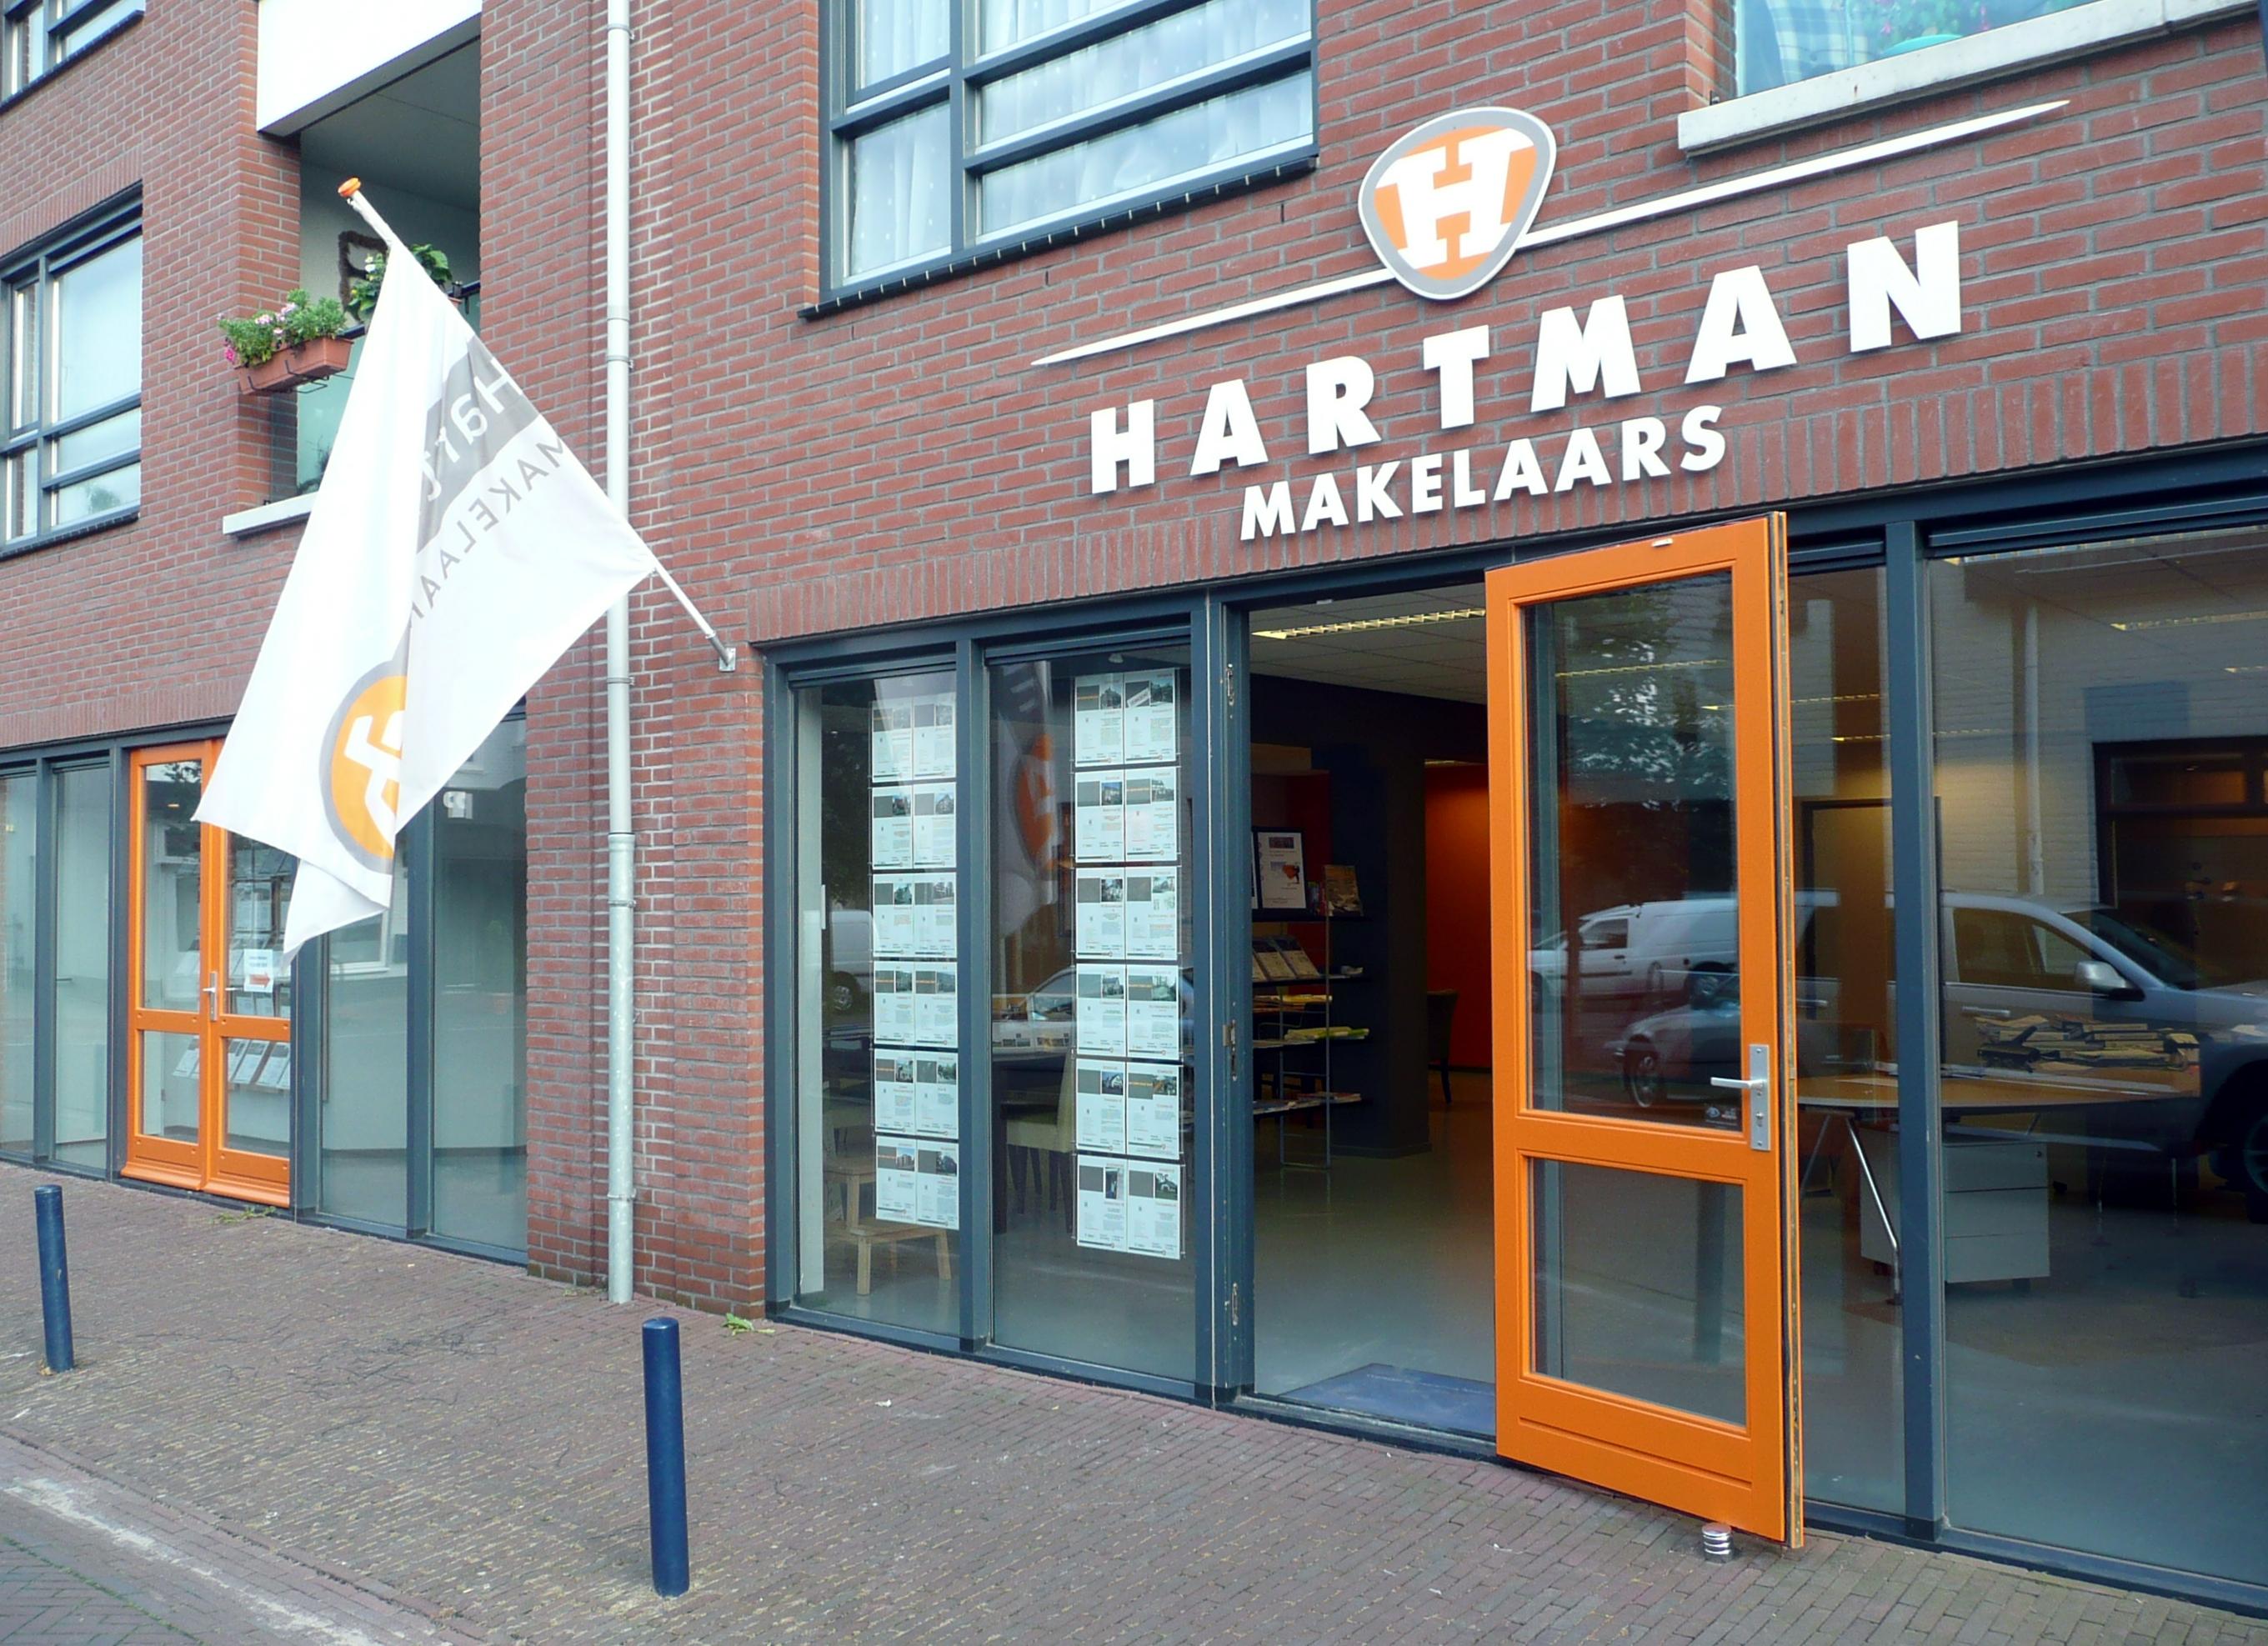 Kantoor Vestiging Hartman Makelaars BV